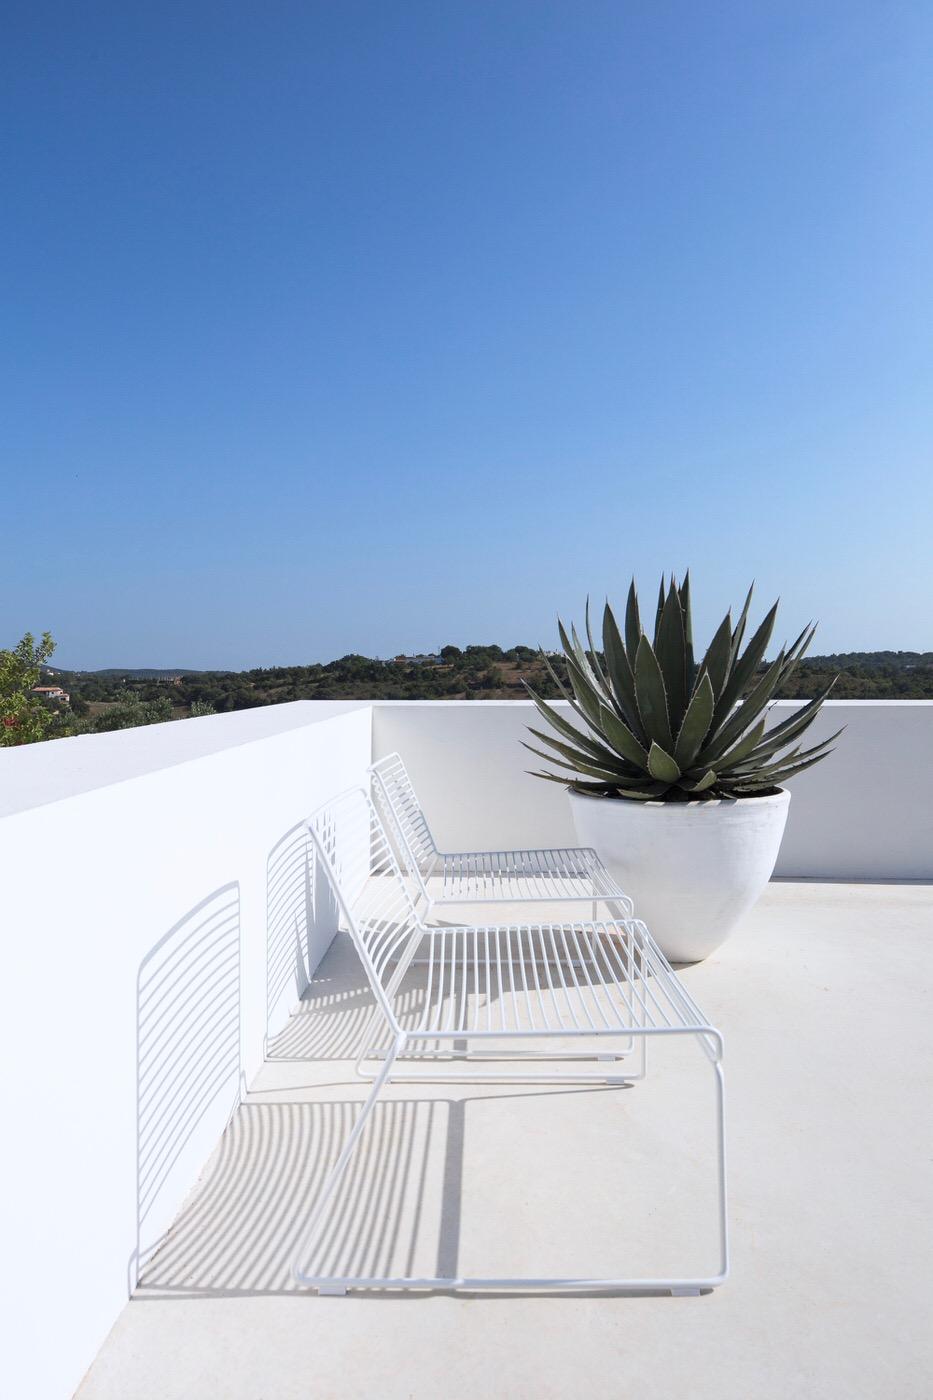 Zalig-Algarve-Casa-Luum-102-1_1